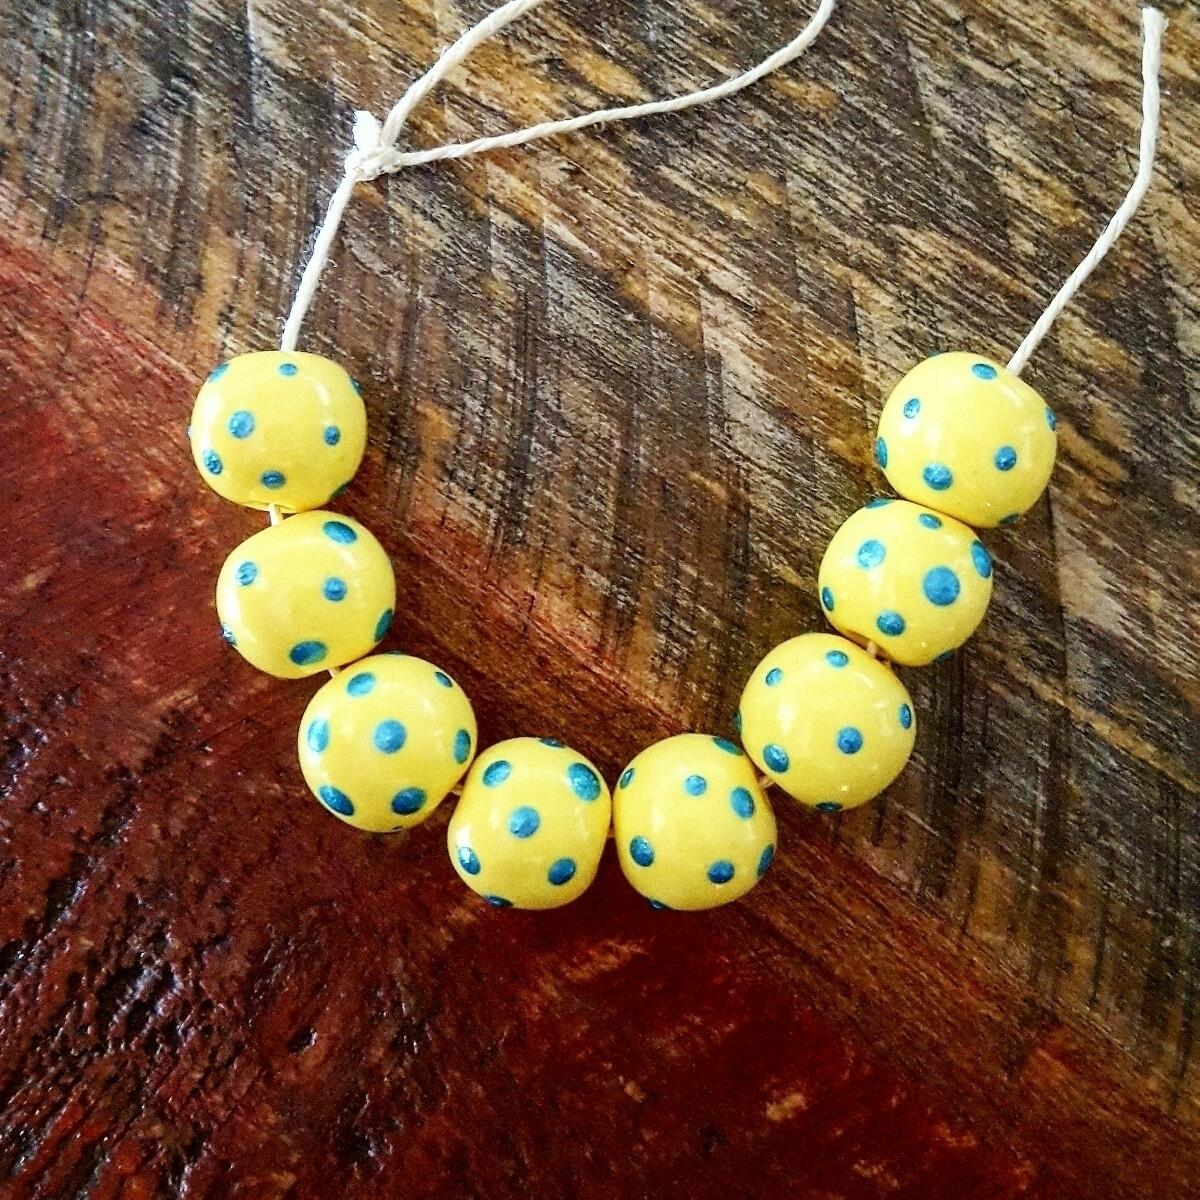 Yellow beads blue metallic polk - jadesculpts | ello